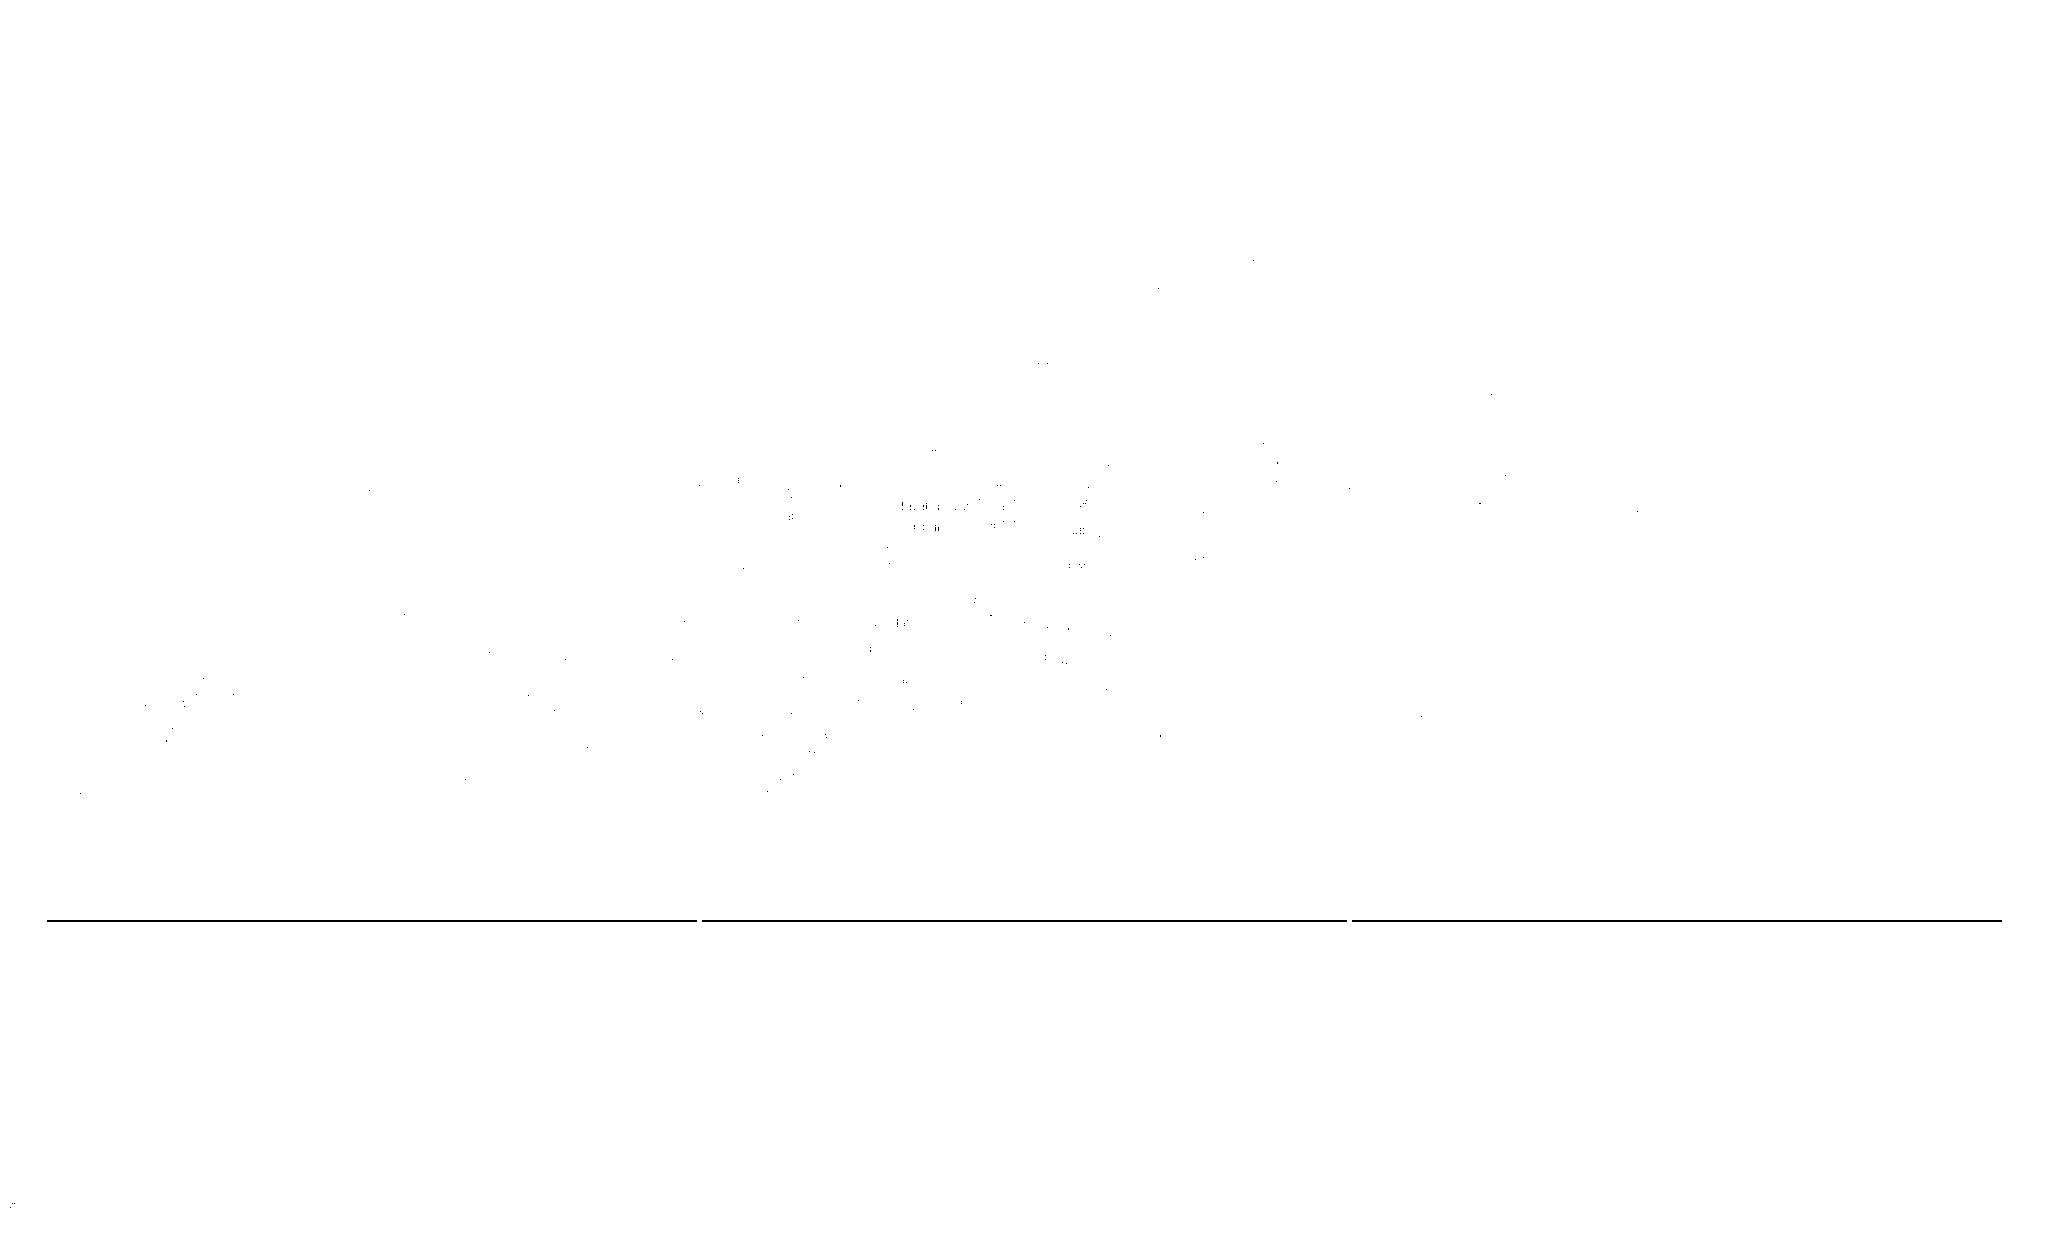 Météo Lille: Prévisions du samedi 17 avril 2021